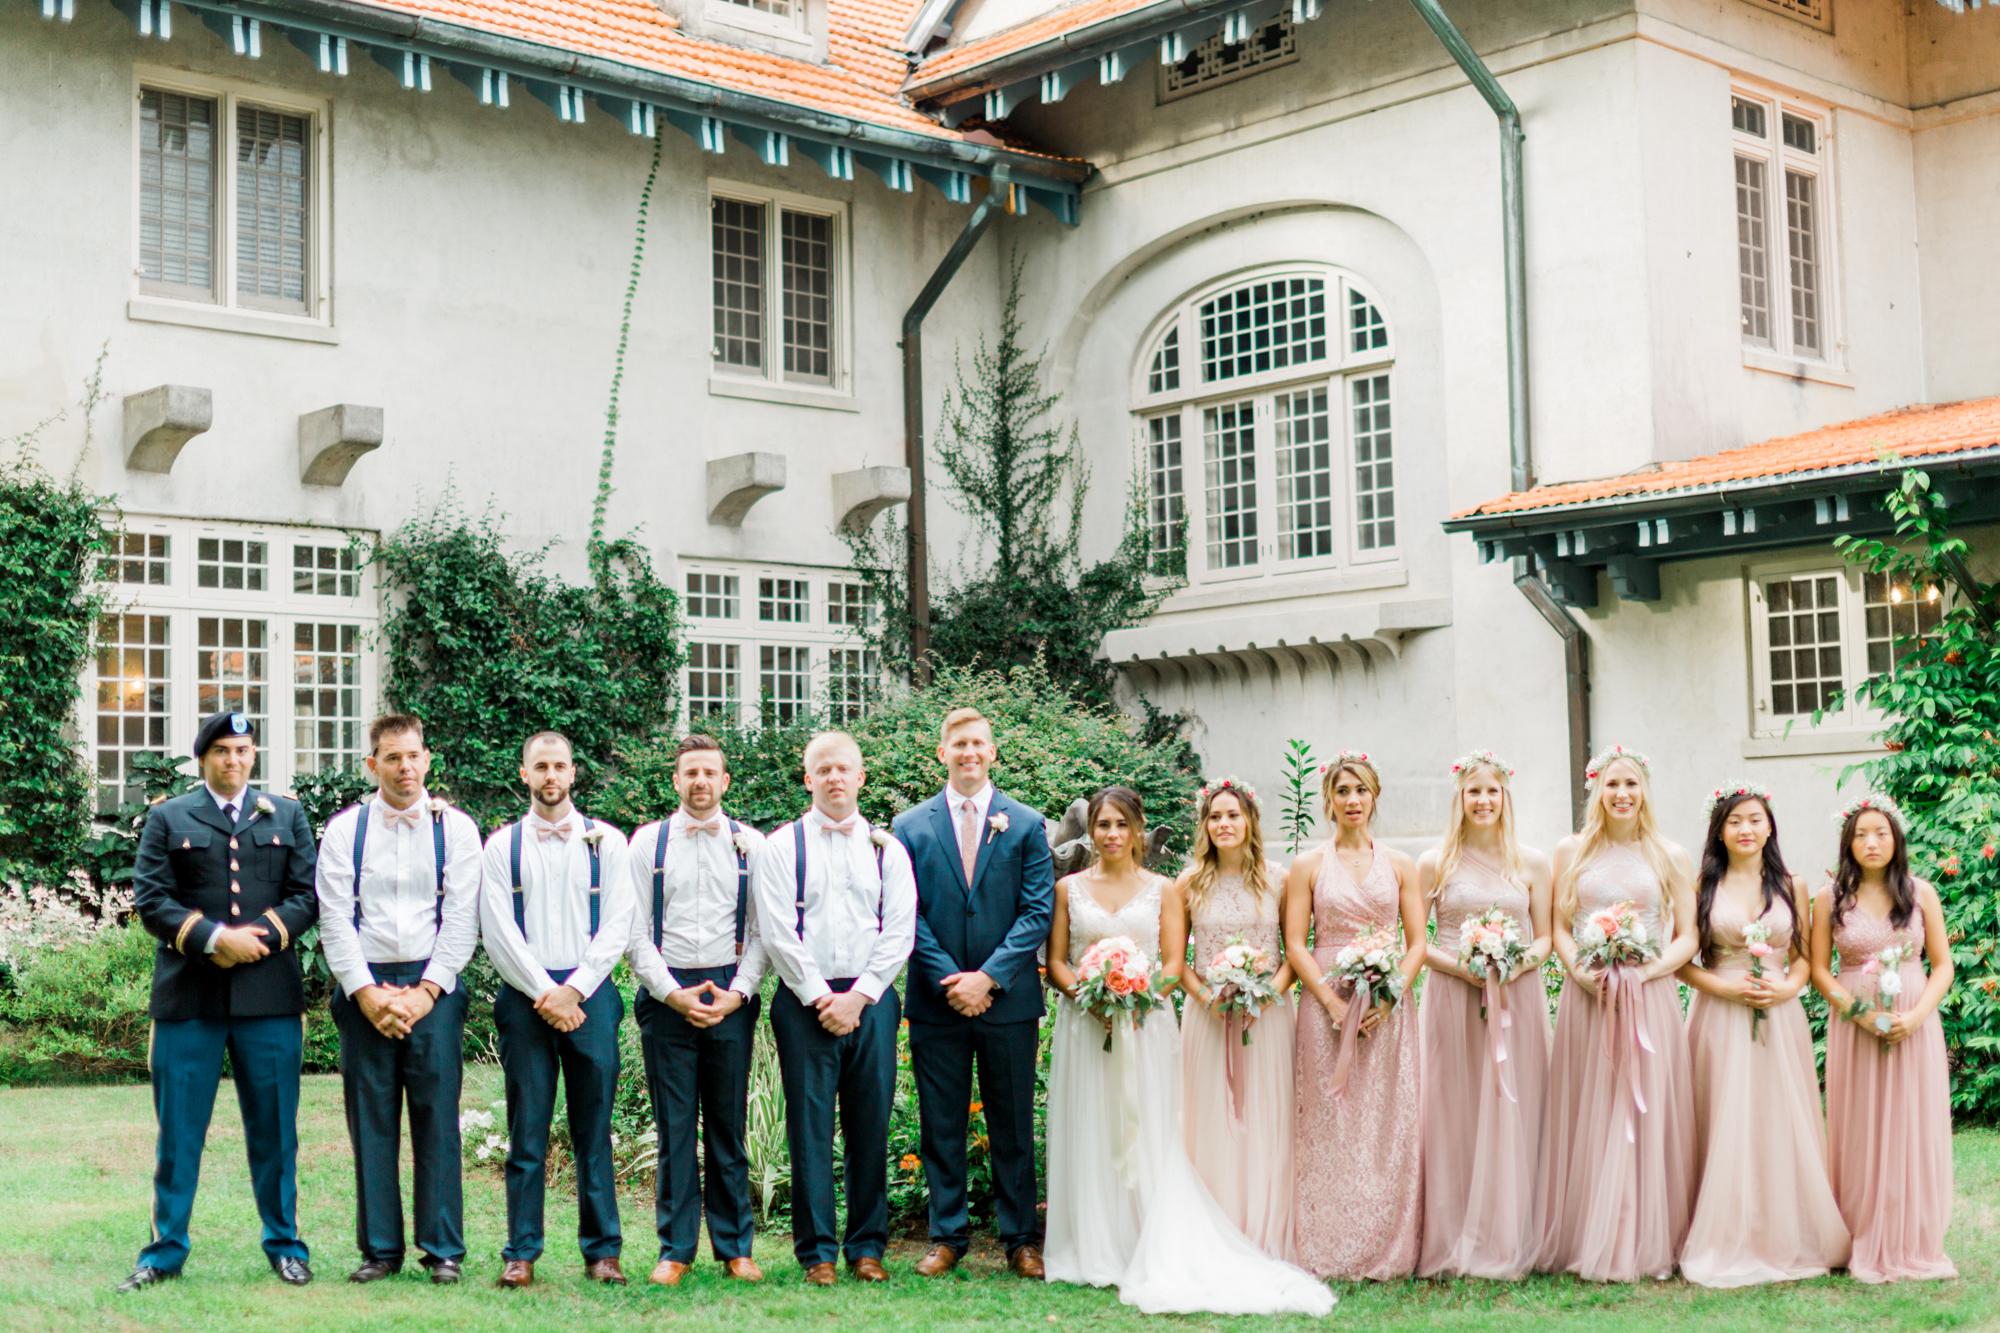 sydonie mansion mount dora orlando fl wedding photos bridal party